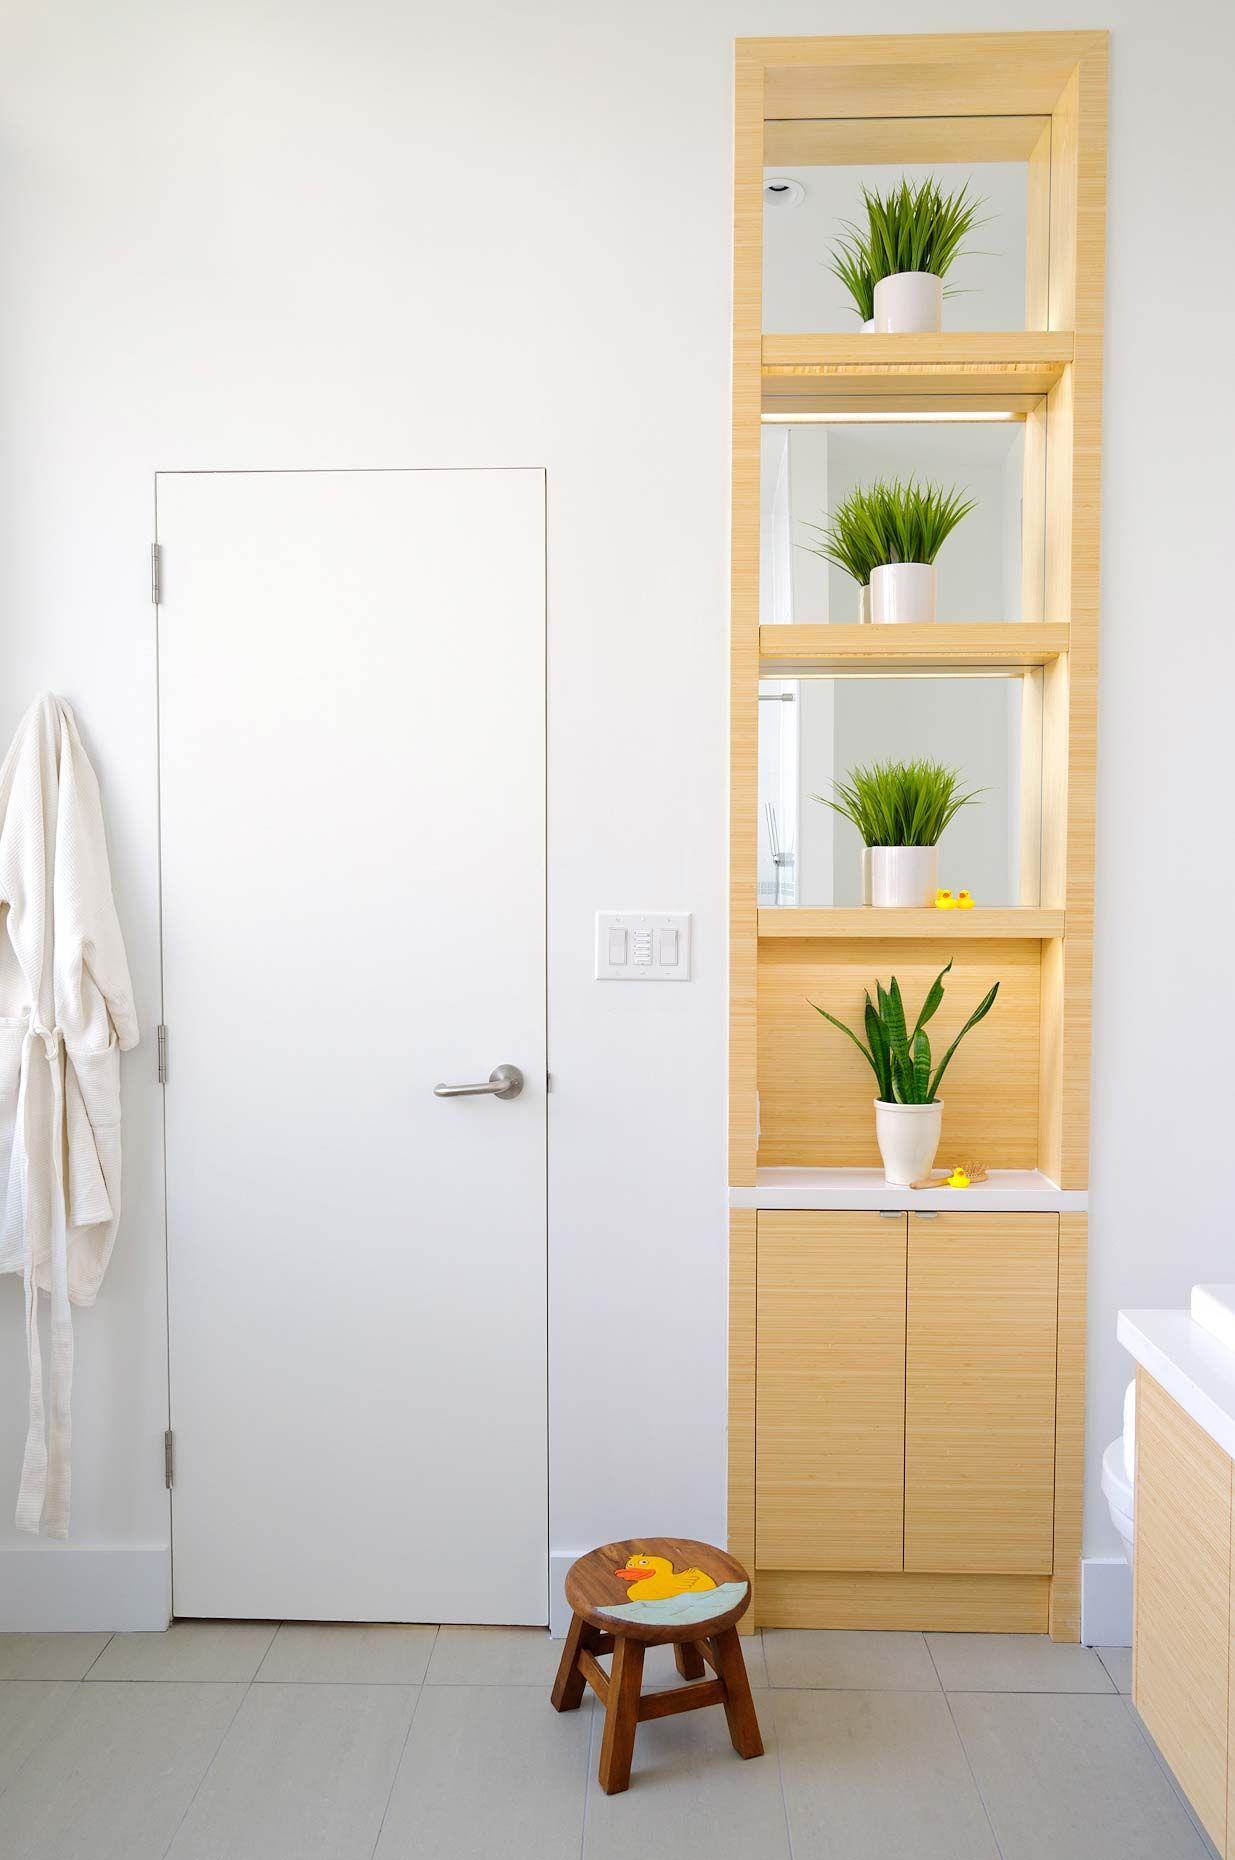 Hearthstone Bathroom 3 | Carriage Lane Bathrooms | Pinterest